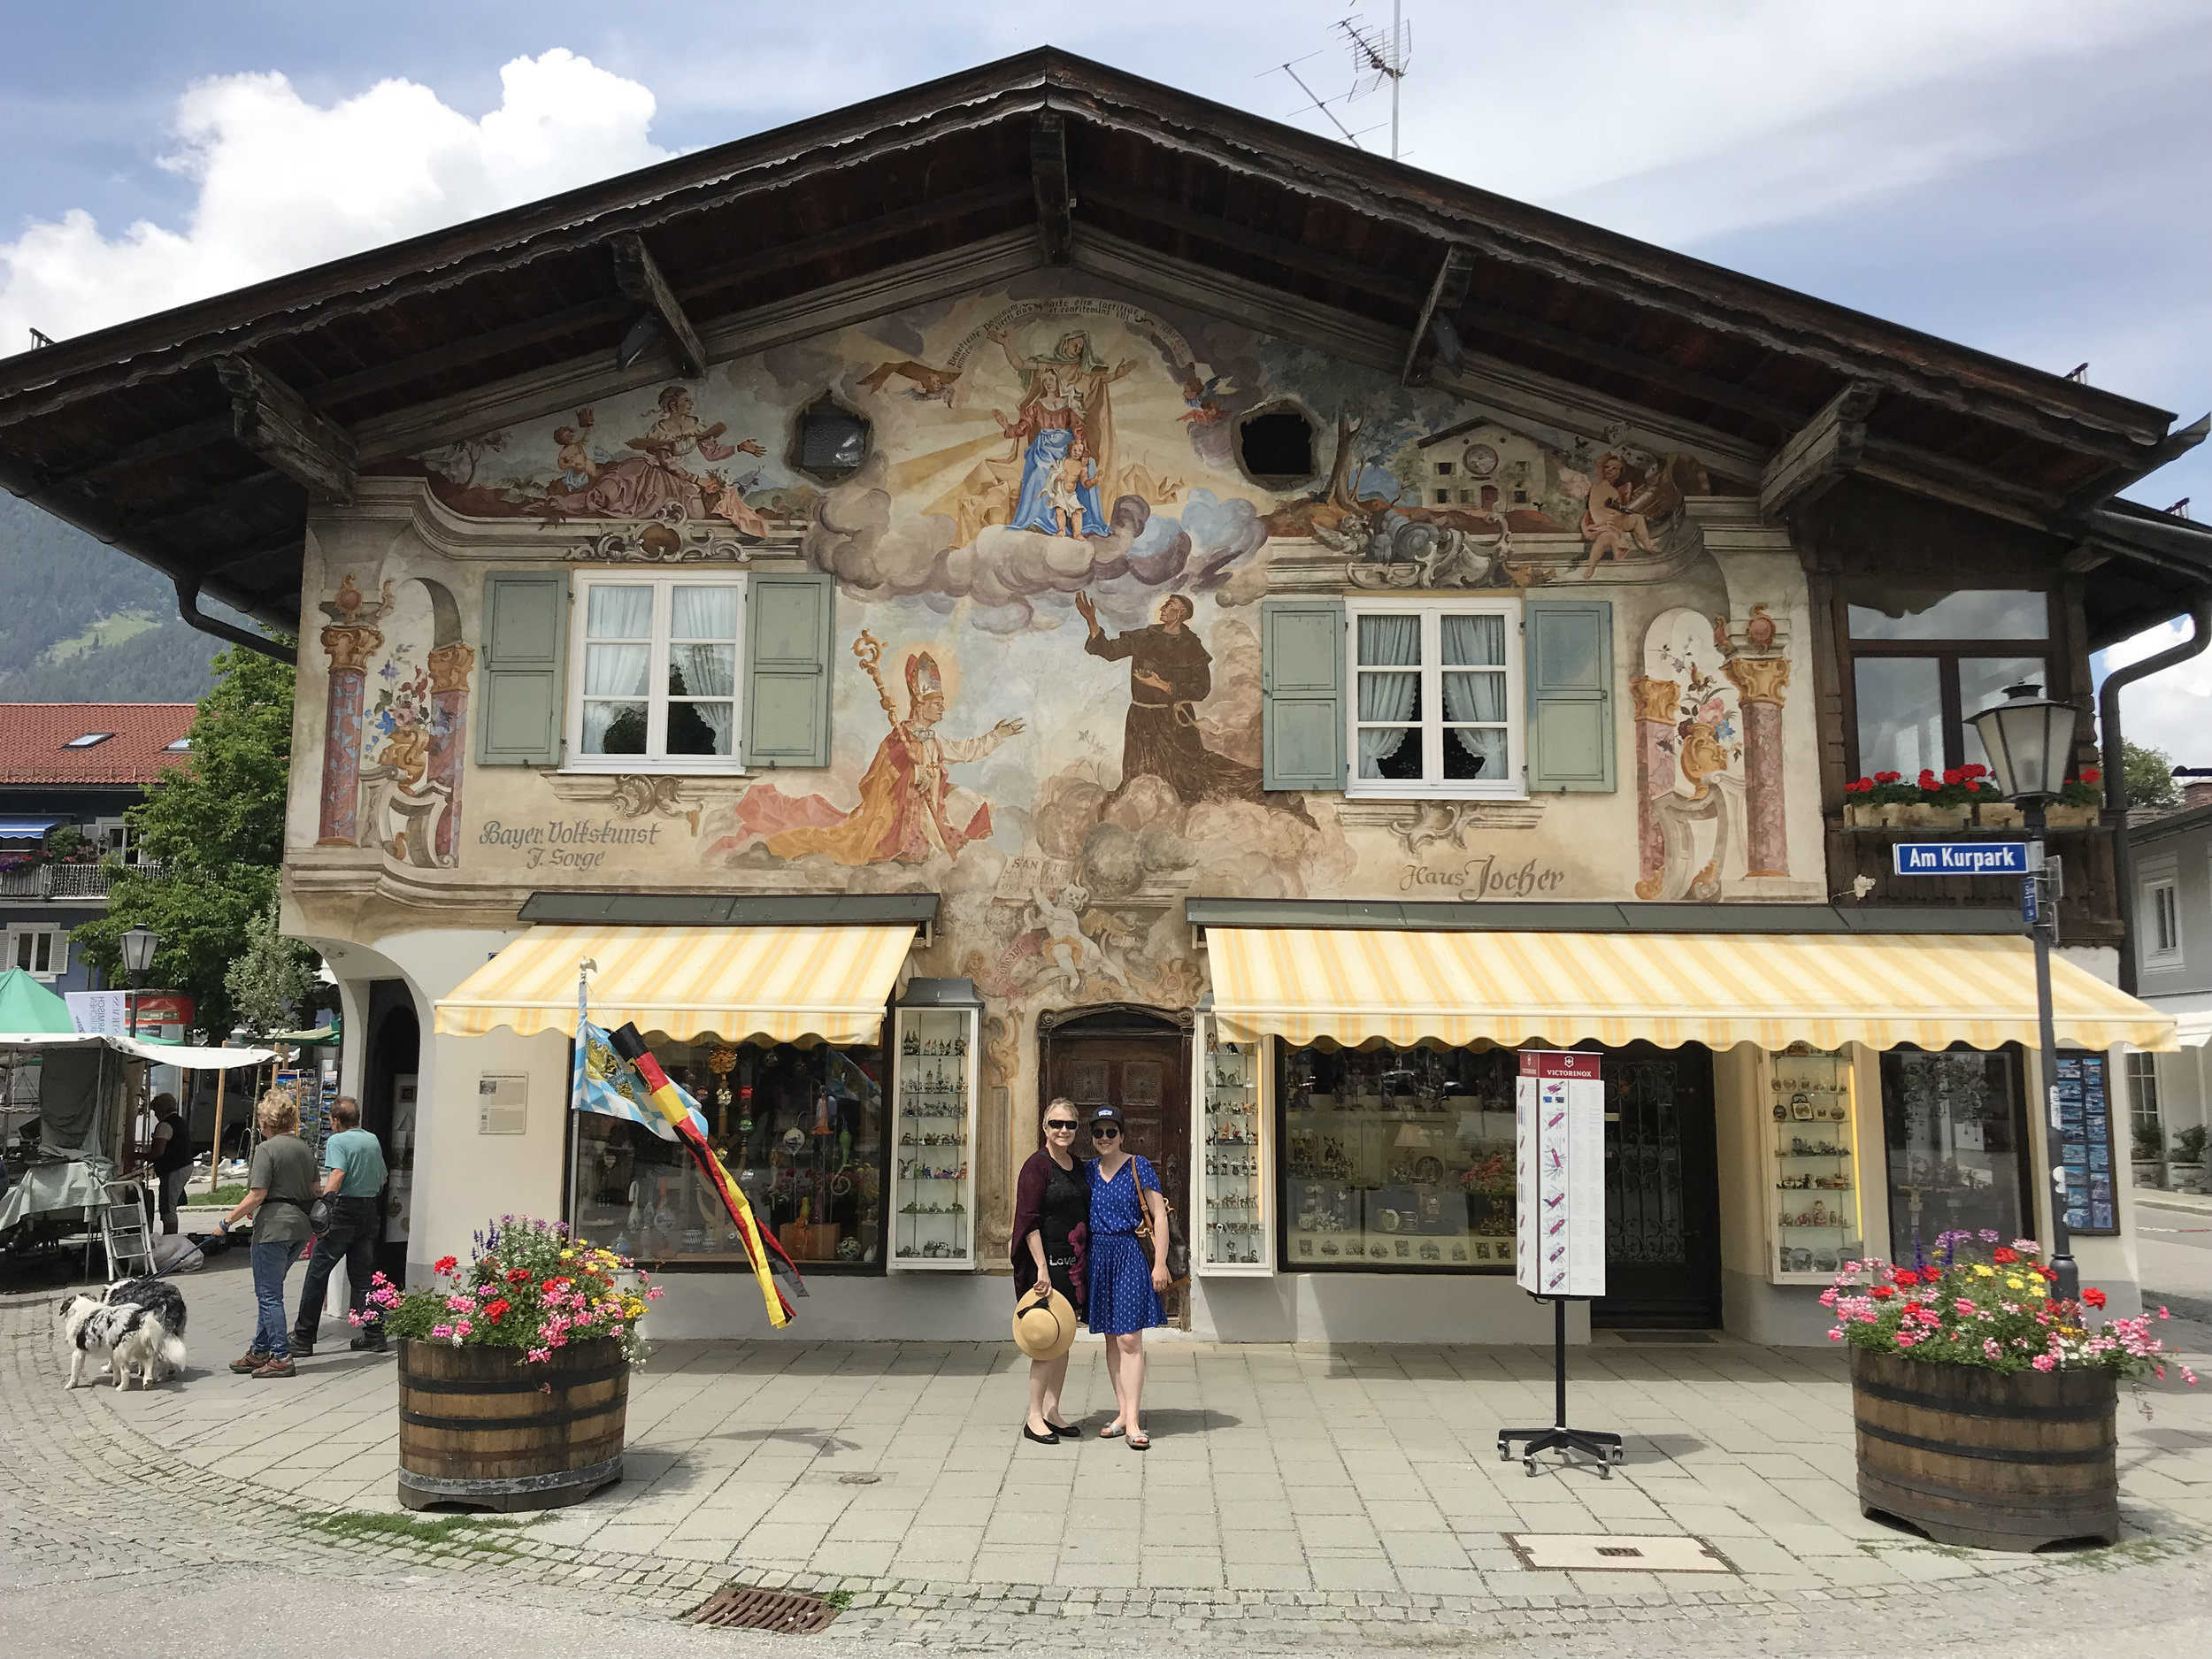 Teri_Bavaria_part3_spiritedtable_photo11.jpg